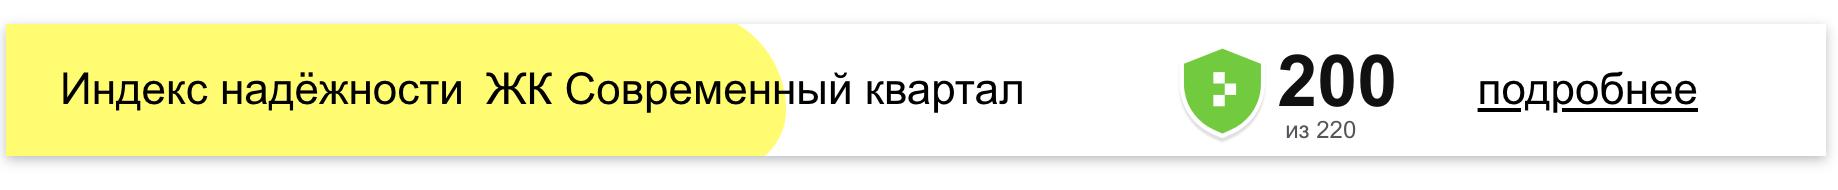 Надежный ЖК